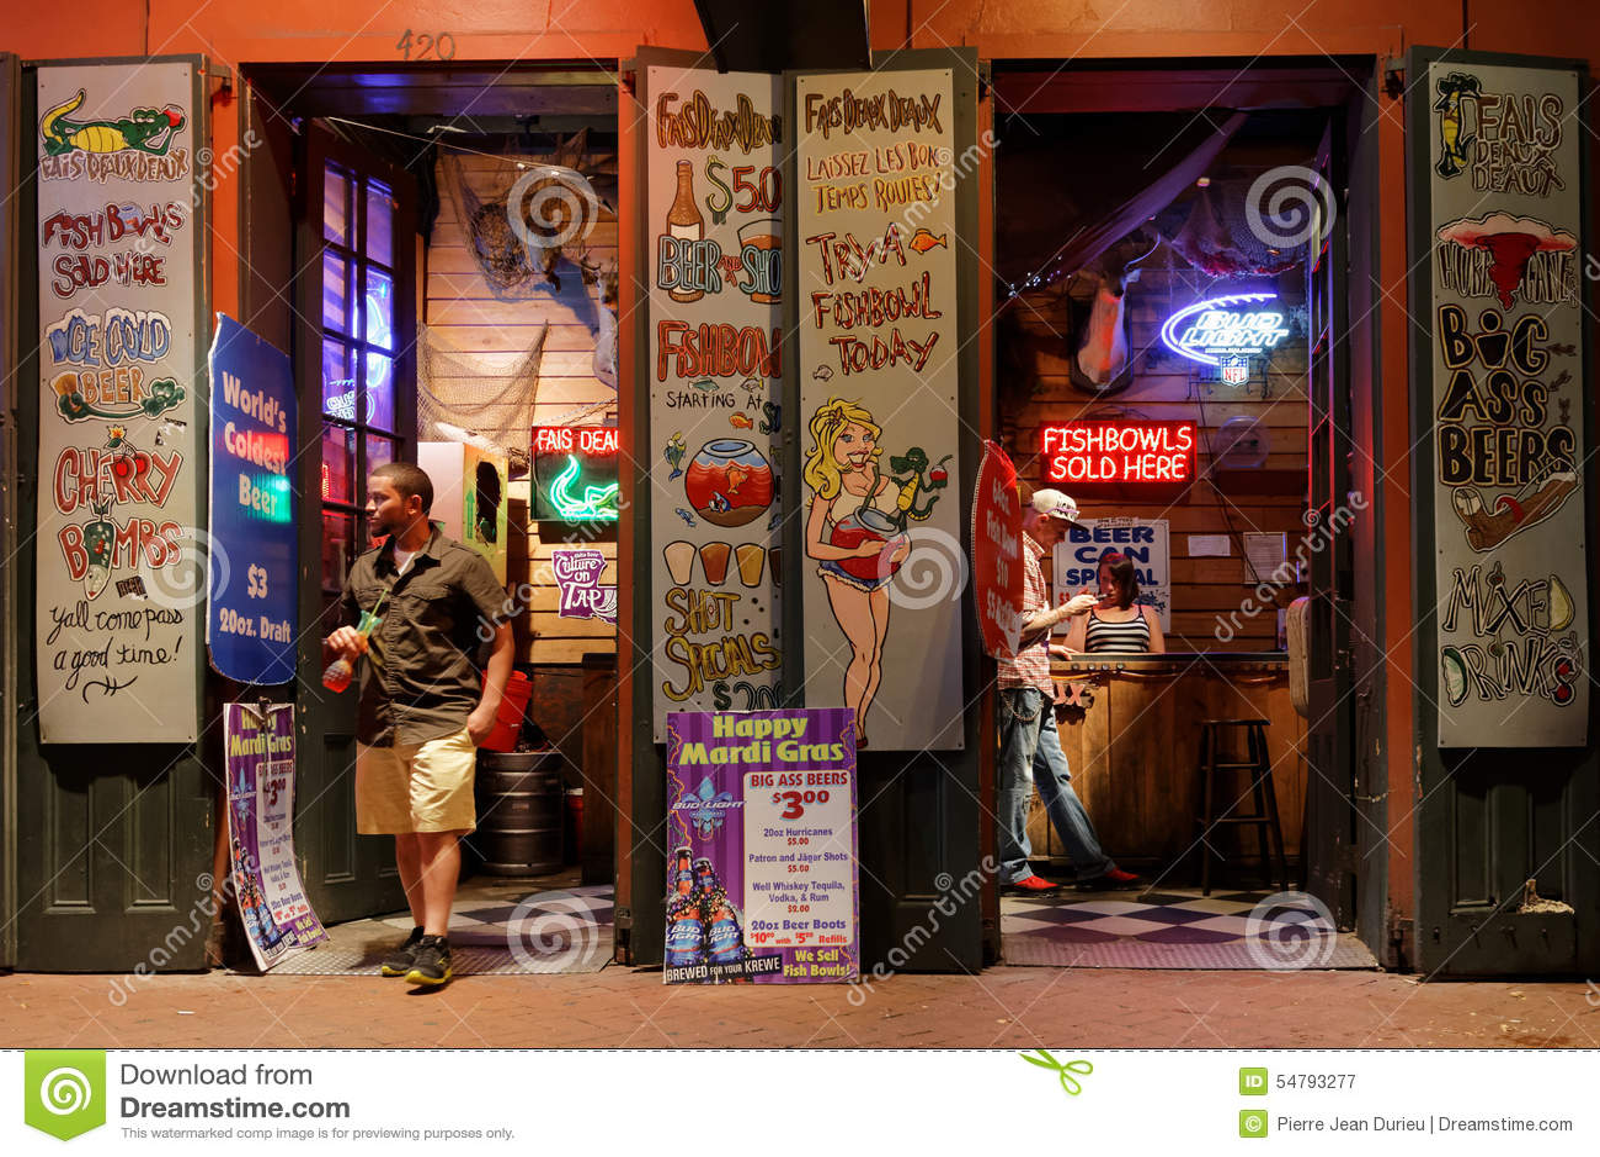 French strip clubs congratulate